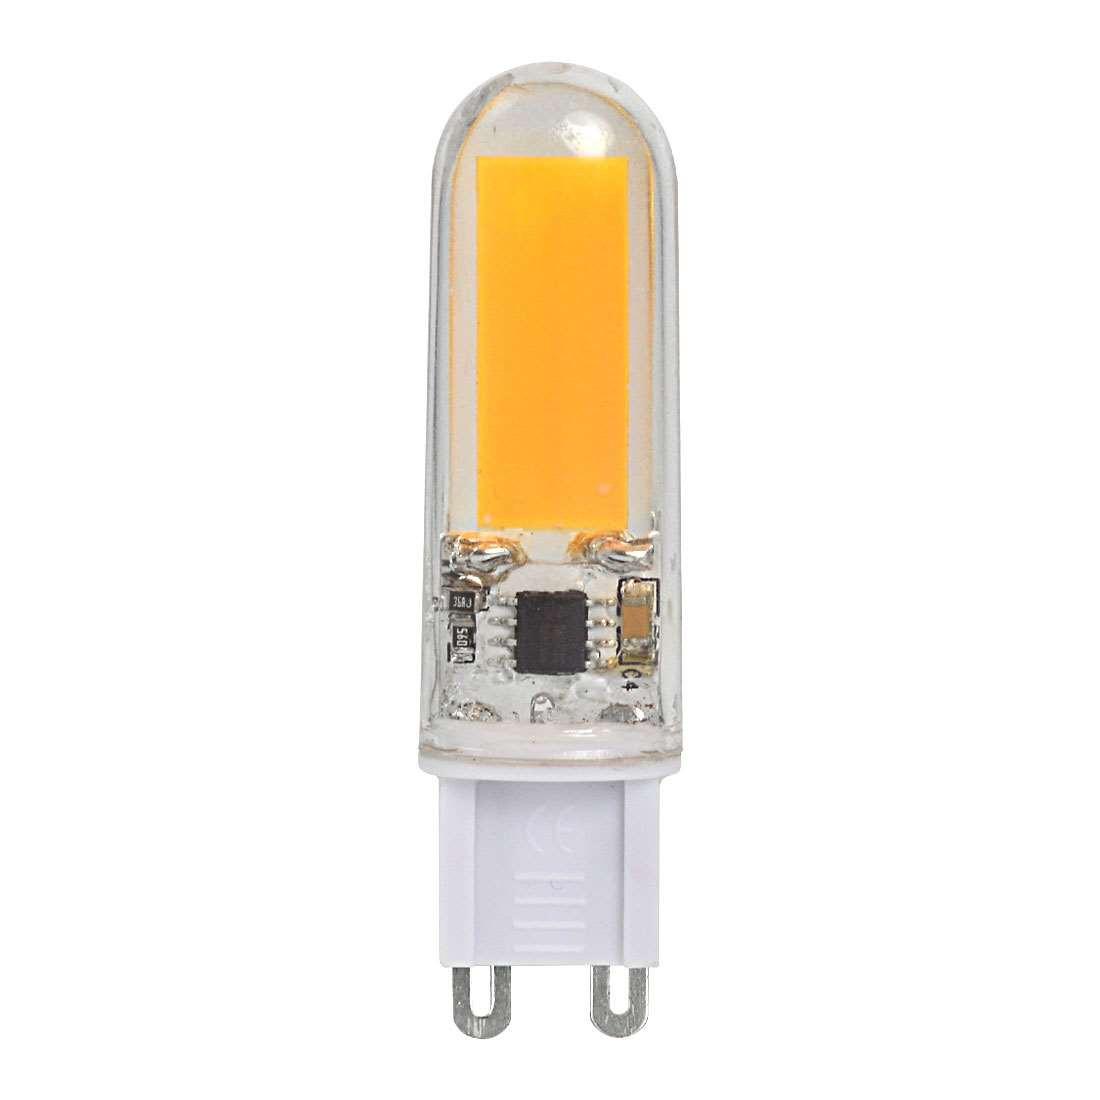 g9 6w led light cob led bulb lamp ac 220 240v in cool white energy saving light led lights. Black Bedroom Furniture Sets. Home Design Ideas